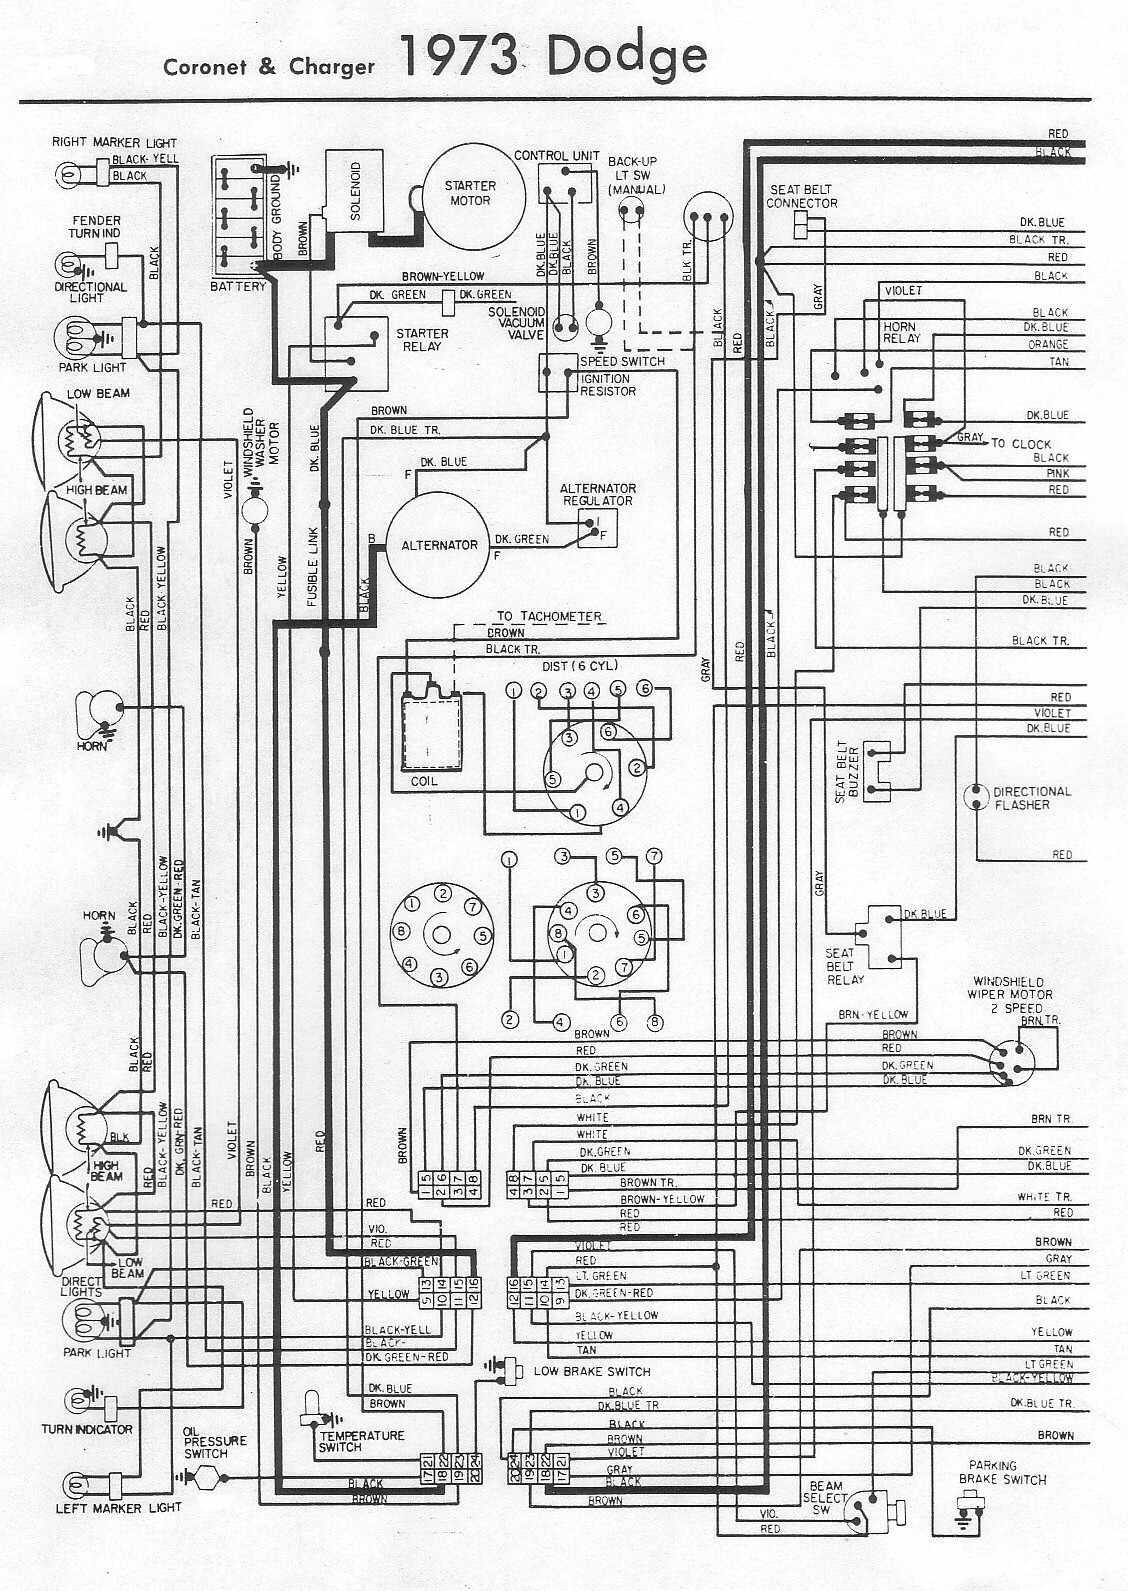 1973 Challenger Wiring Diagram Simple Wiring Diagram Detailed 1956 Dodge  Truck Wiring Diagram 1973 Dodge Truck Wiring Diagram